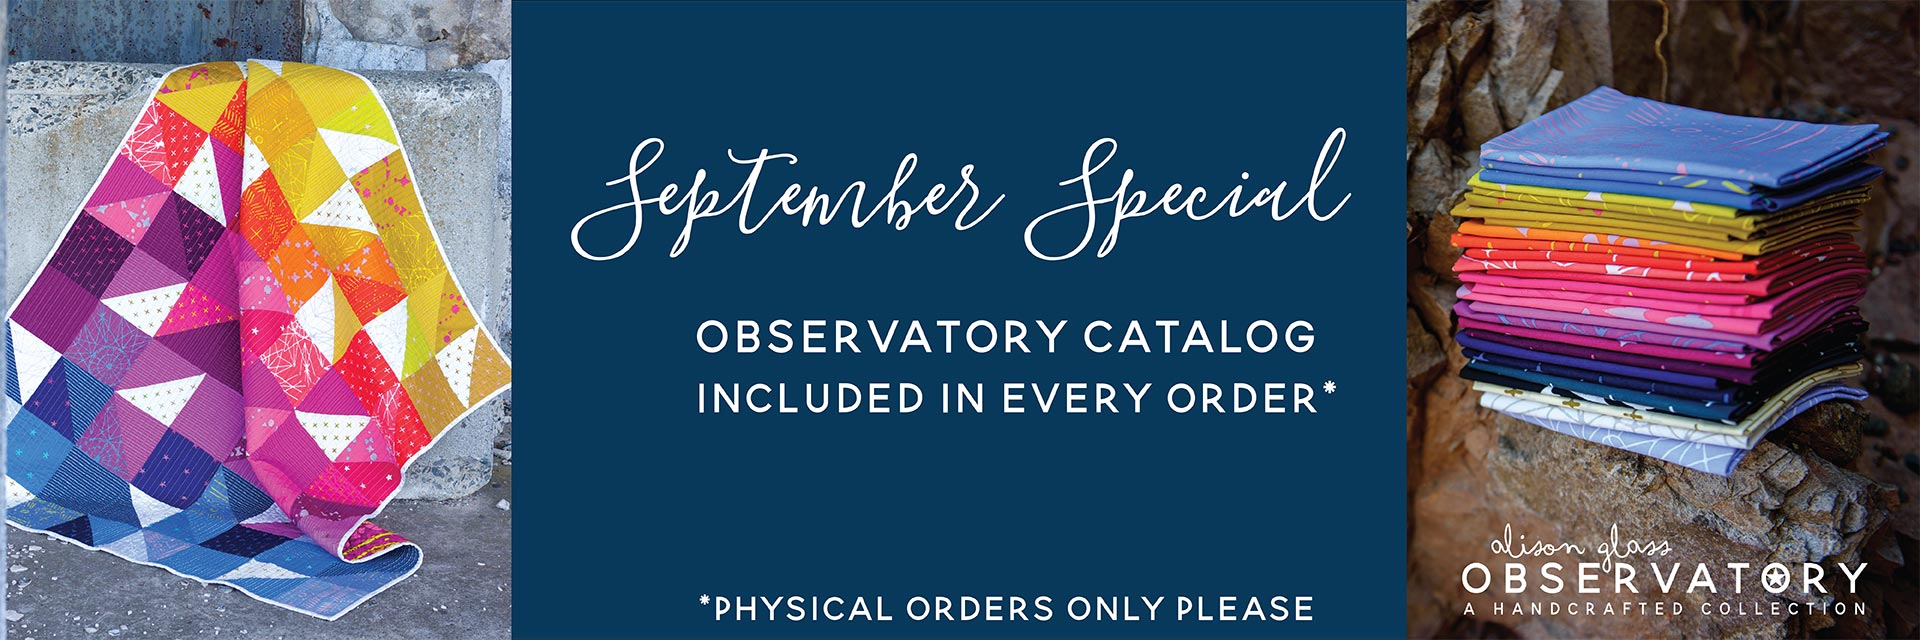 september special - free observatory catalog